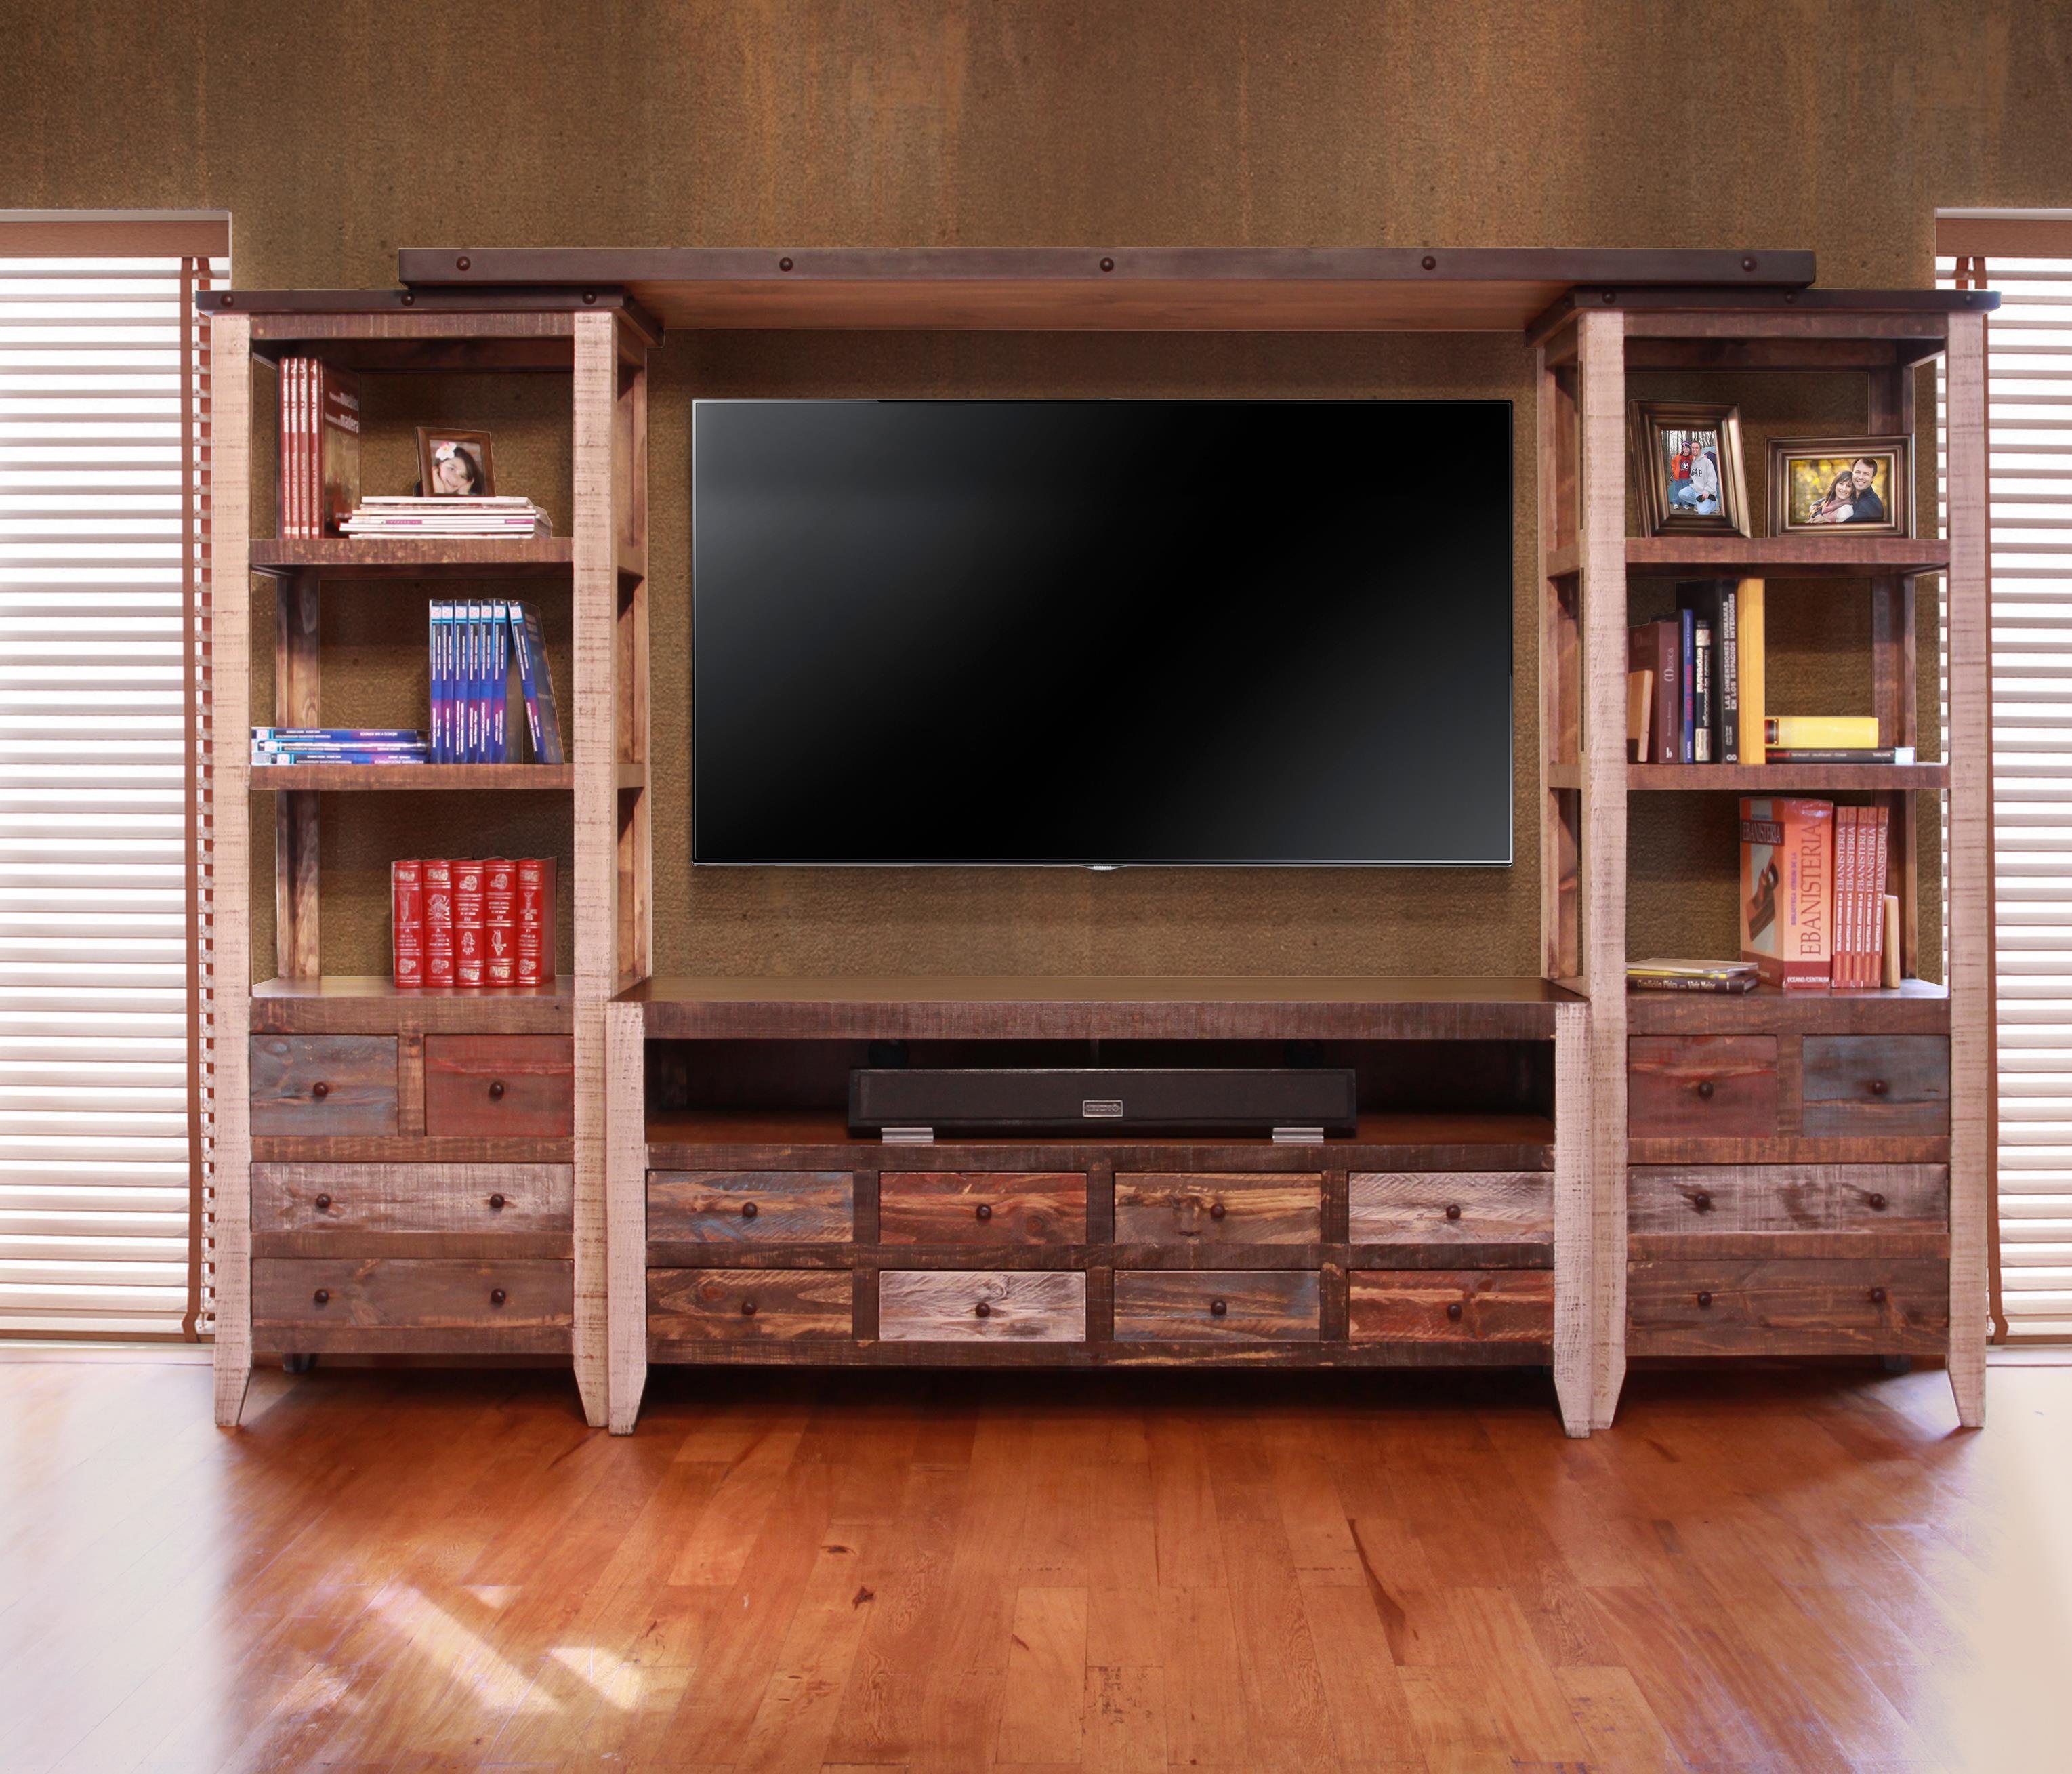 900 Antique Wall Unit by International Furniture Direct at Goffena Furniture & Mattress Center